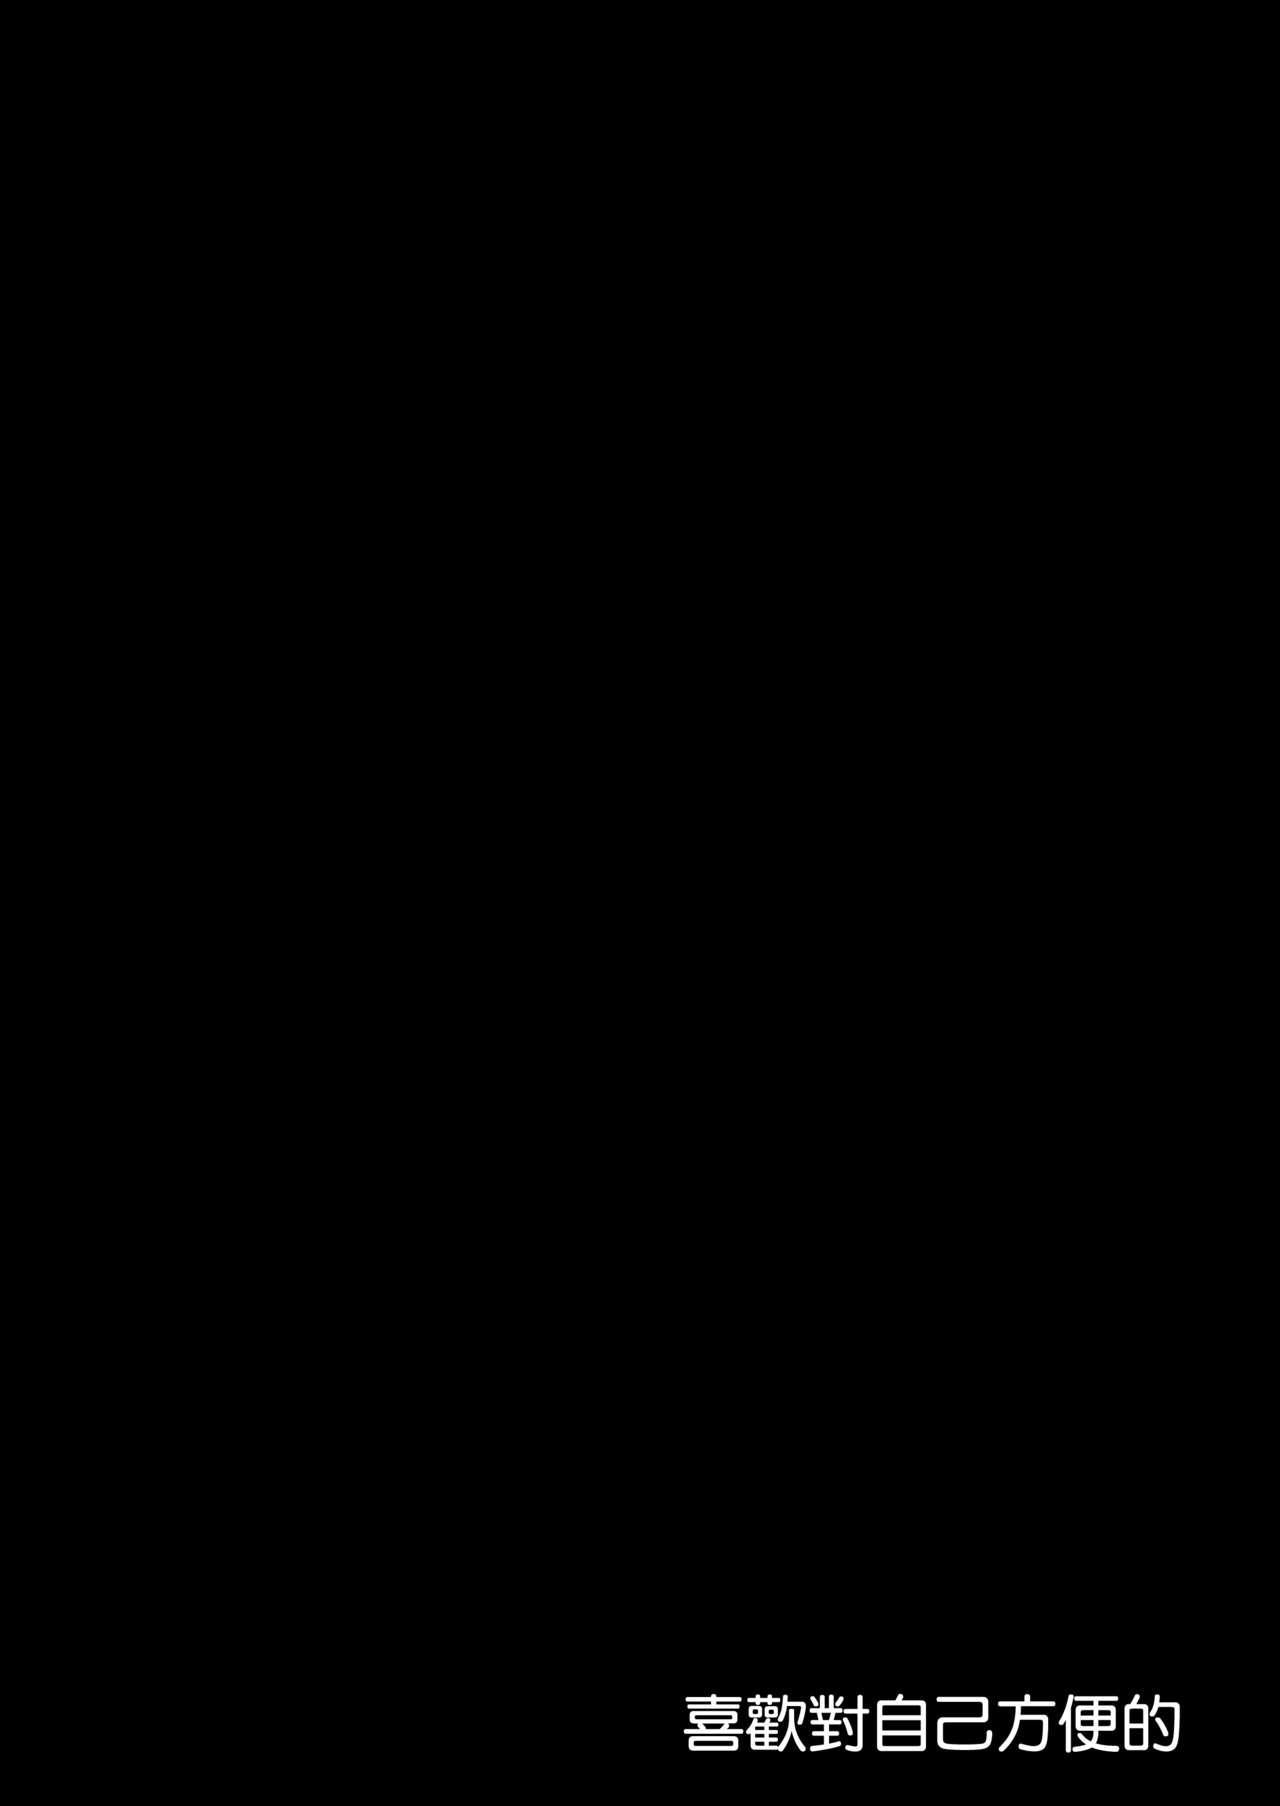 (C97) [Cow Lipid (Fuurai)] U-D-N-S (Fate/Grand Order) [Chinese] [空気系☆漢化] 3